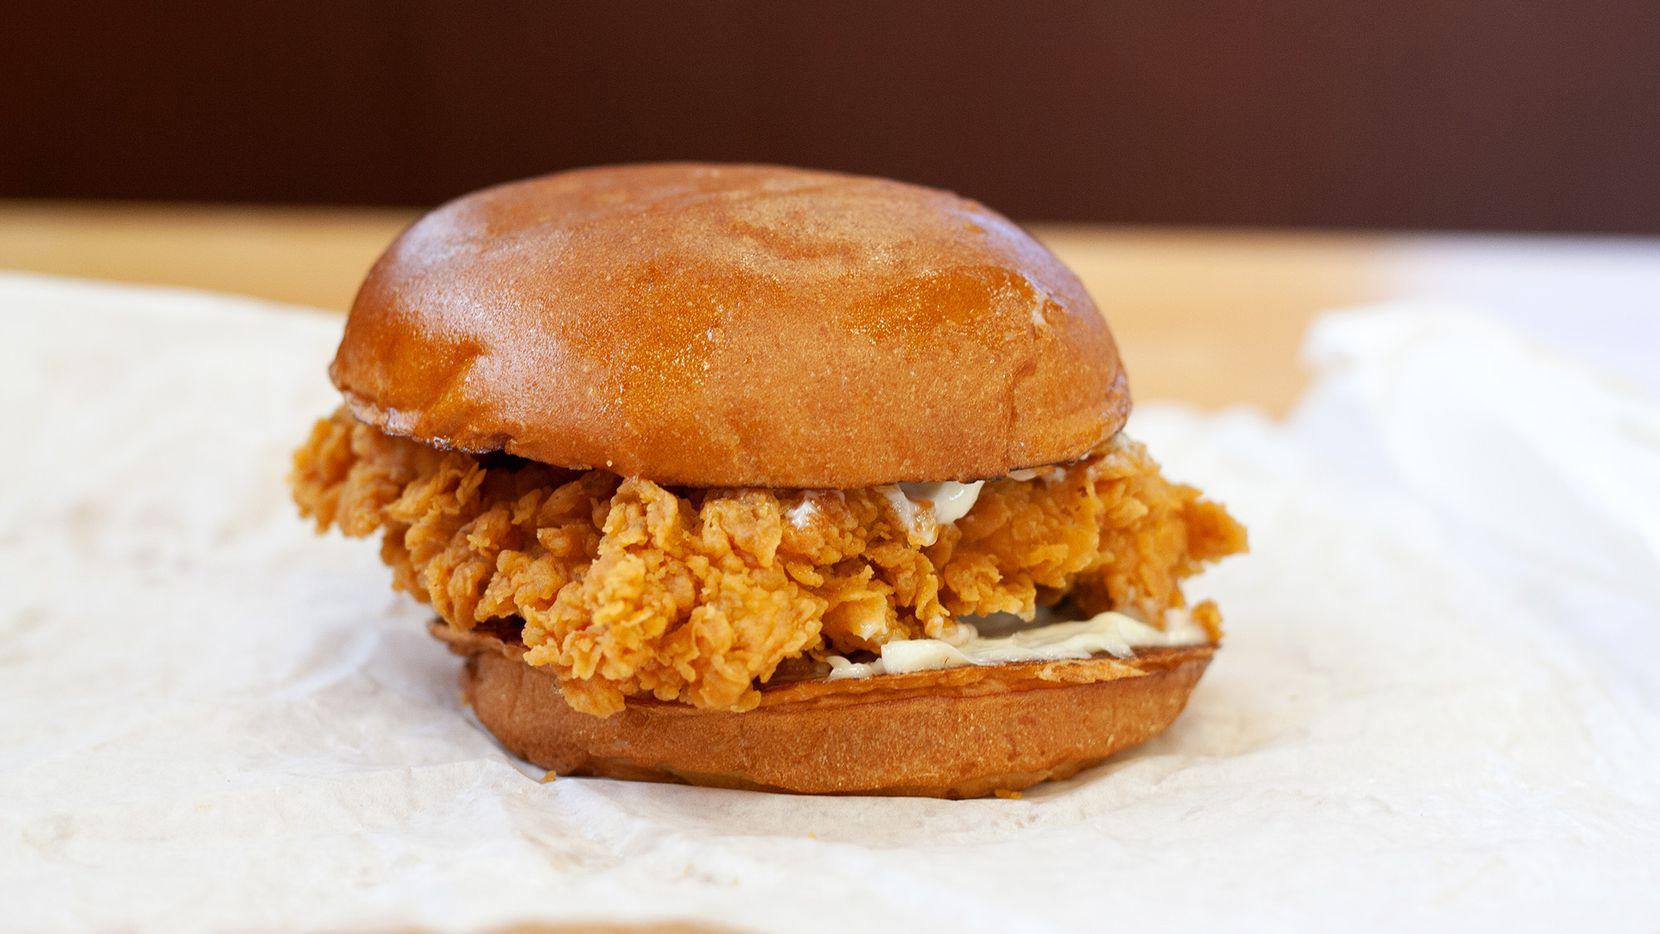 Popeyes Crazy Popular Fried Chicken Sandwich Returns Nov 3